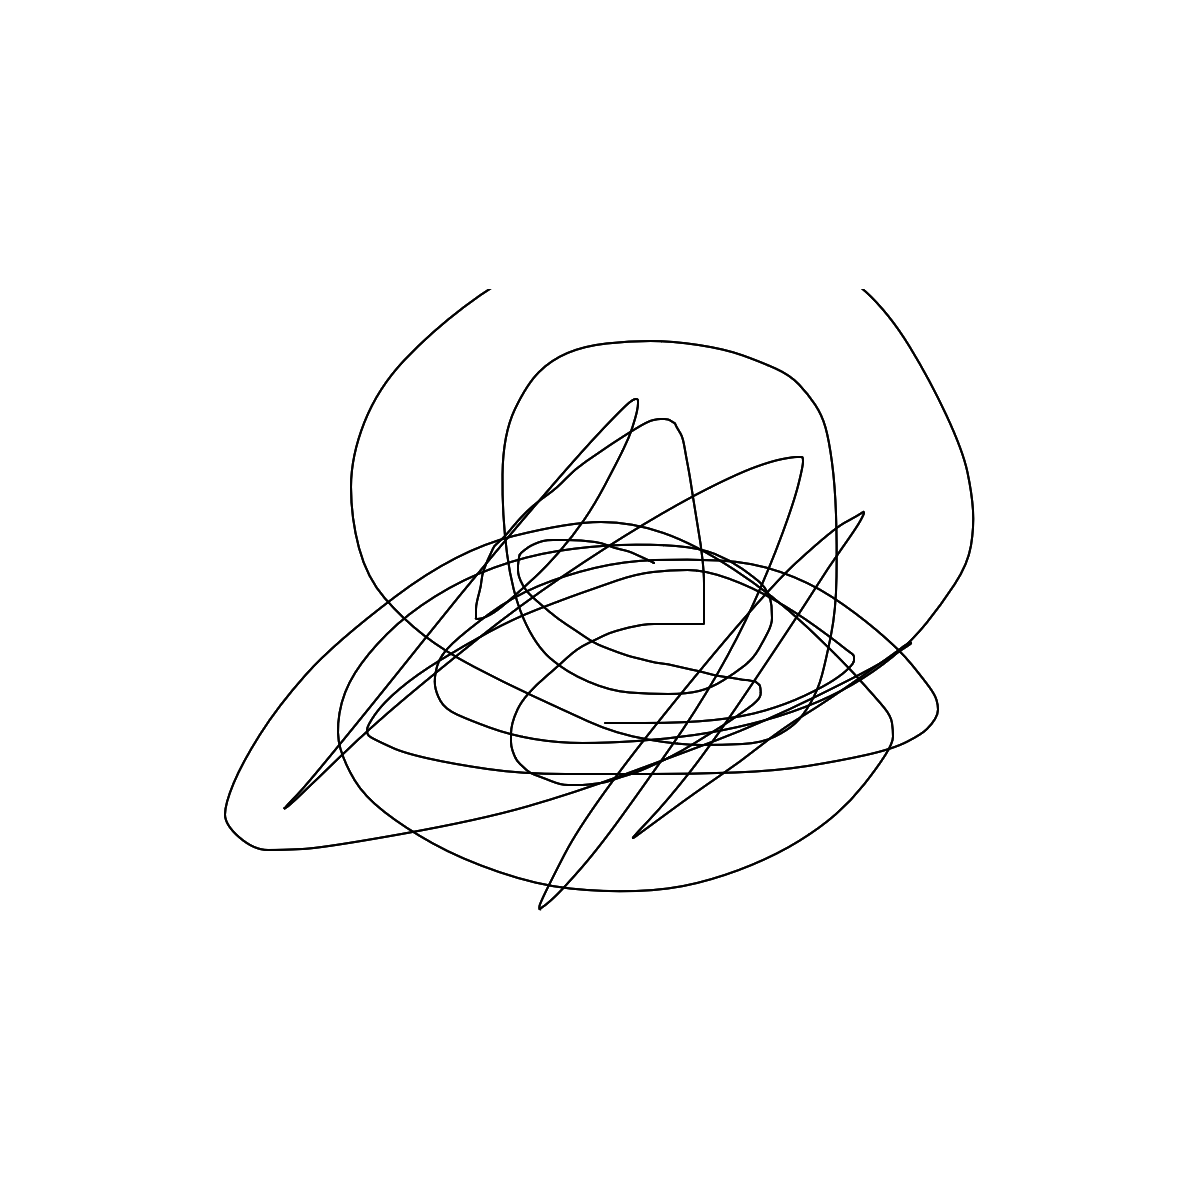 BAAAM drawing#11788 lat:44.3571853637695300lng: -79.7128219604492200